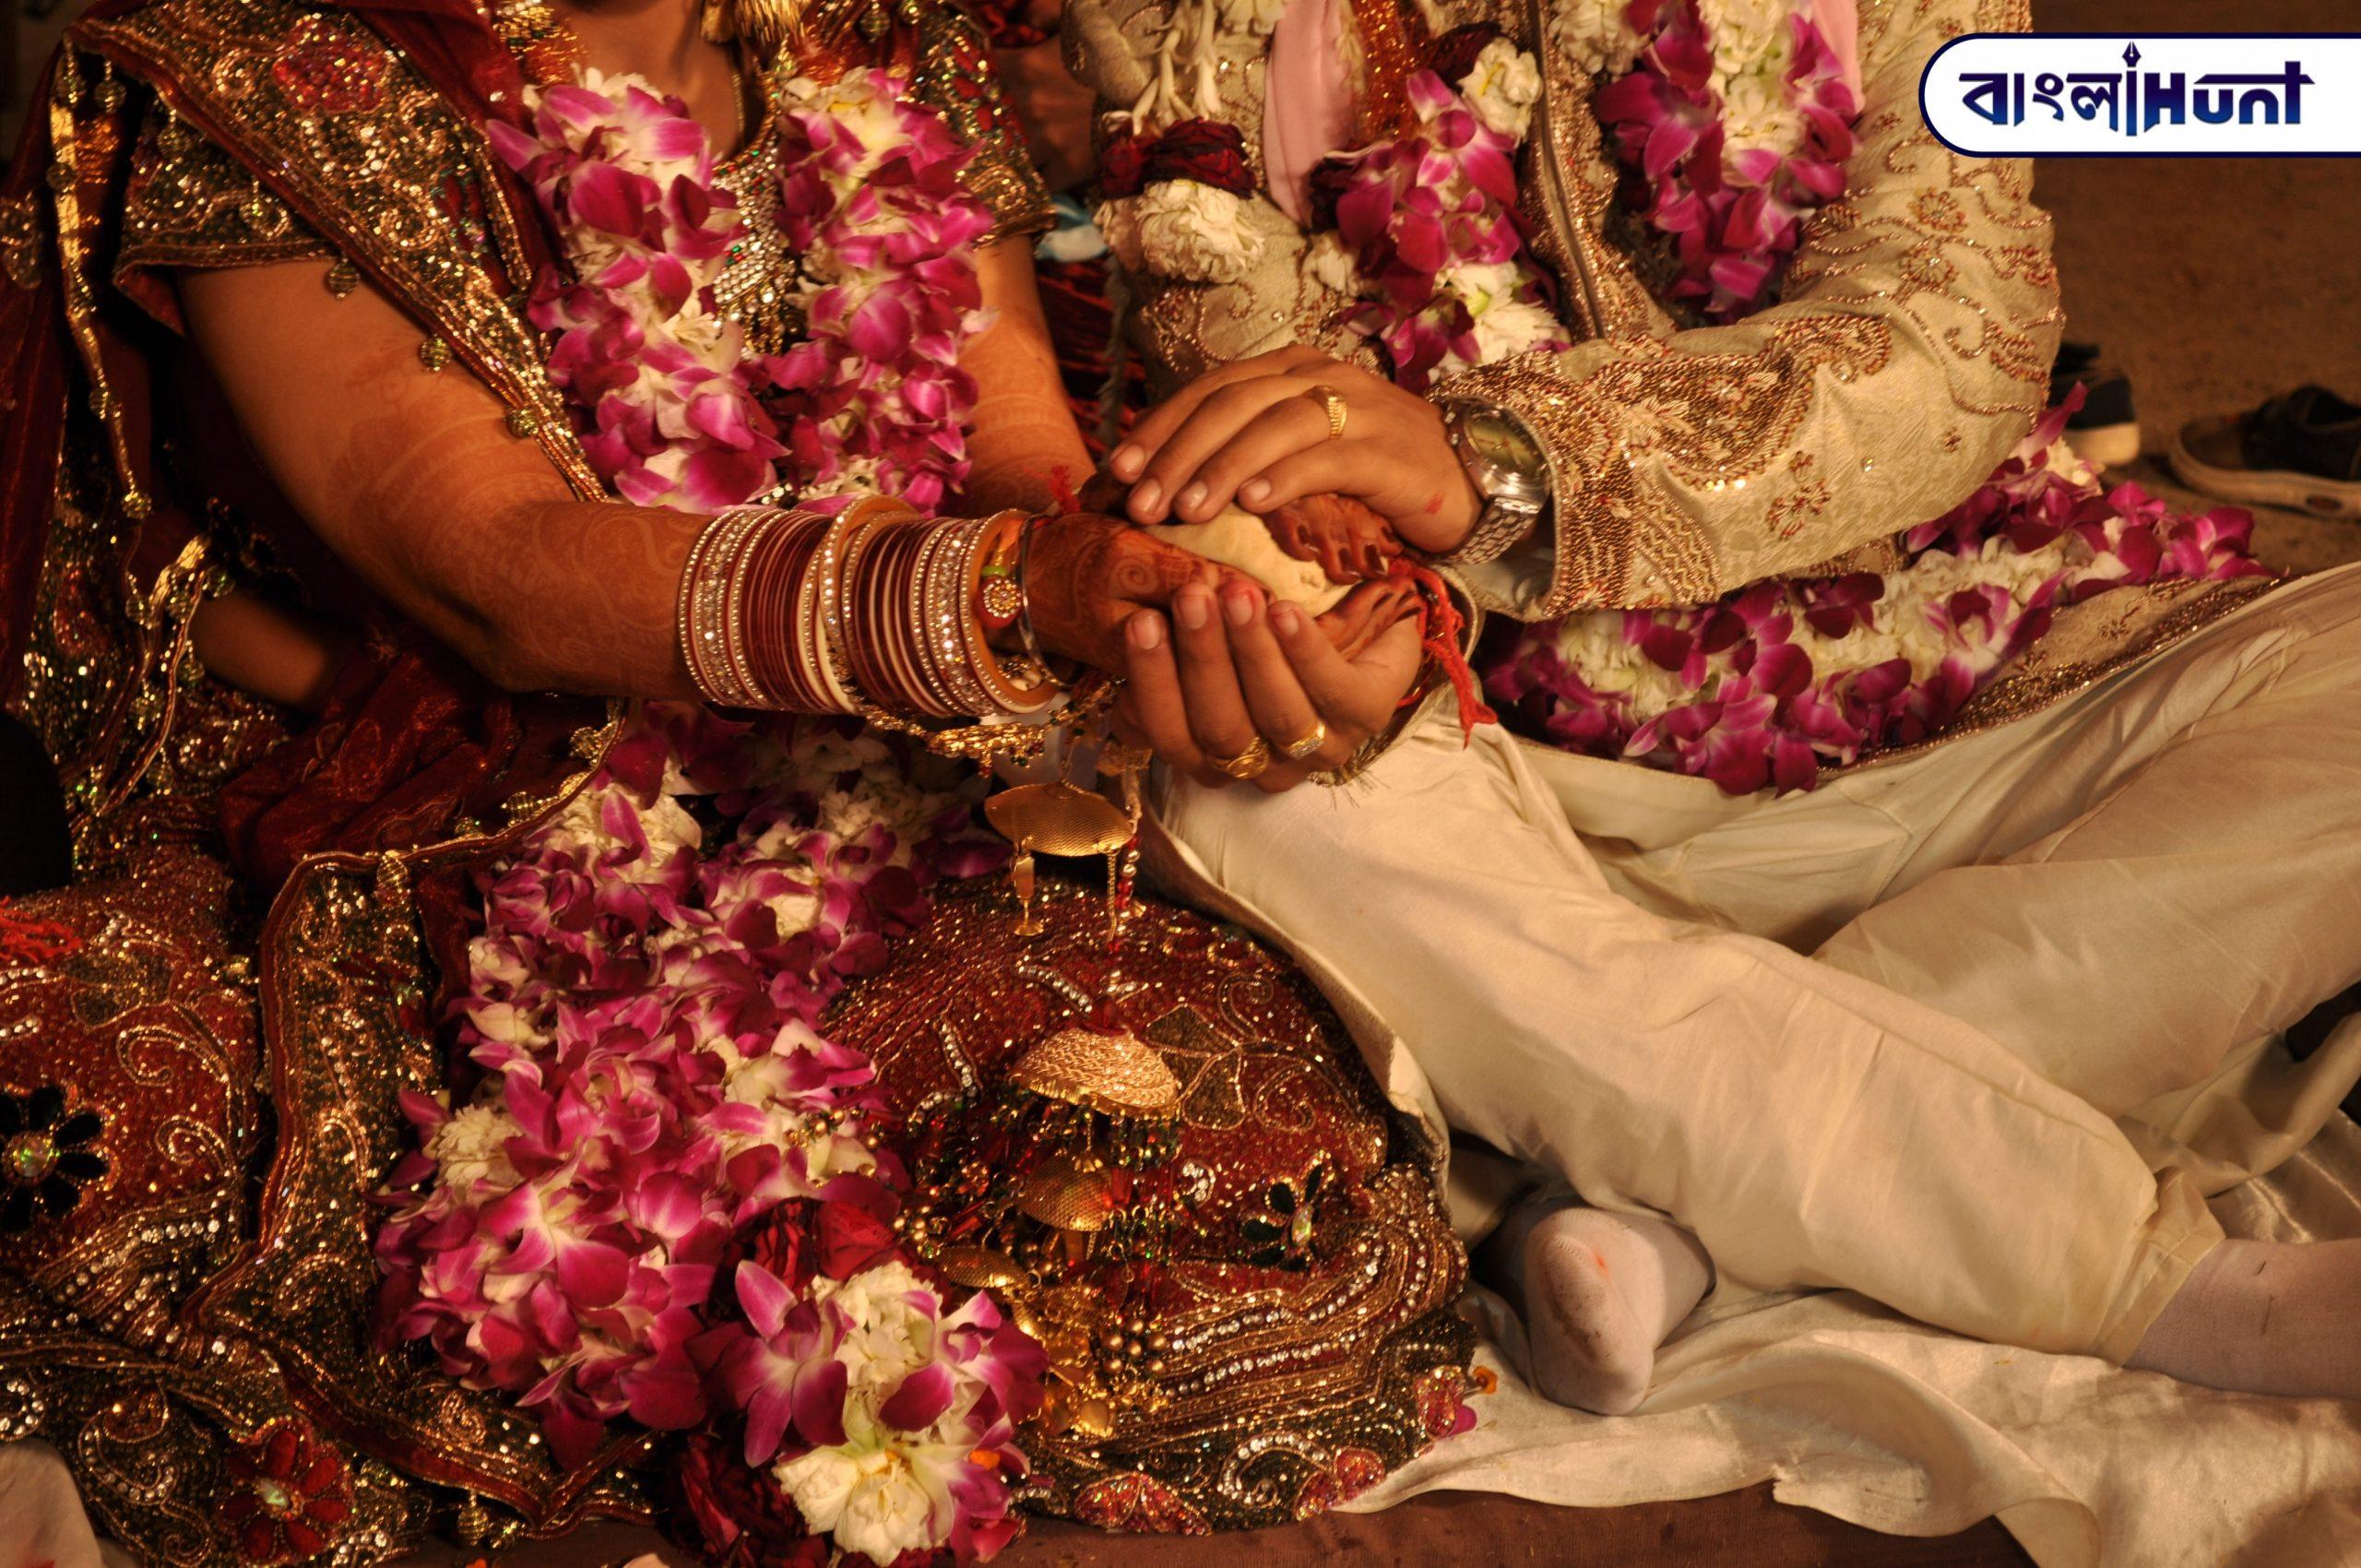 Indian wedding Delhi scaled Bangla Hunt Bengali News